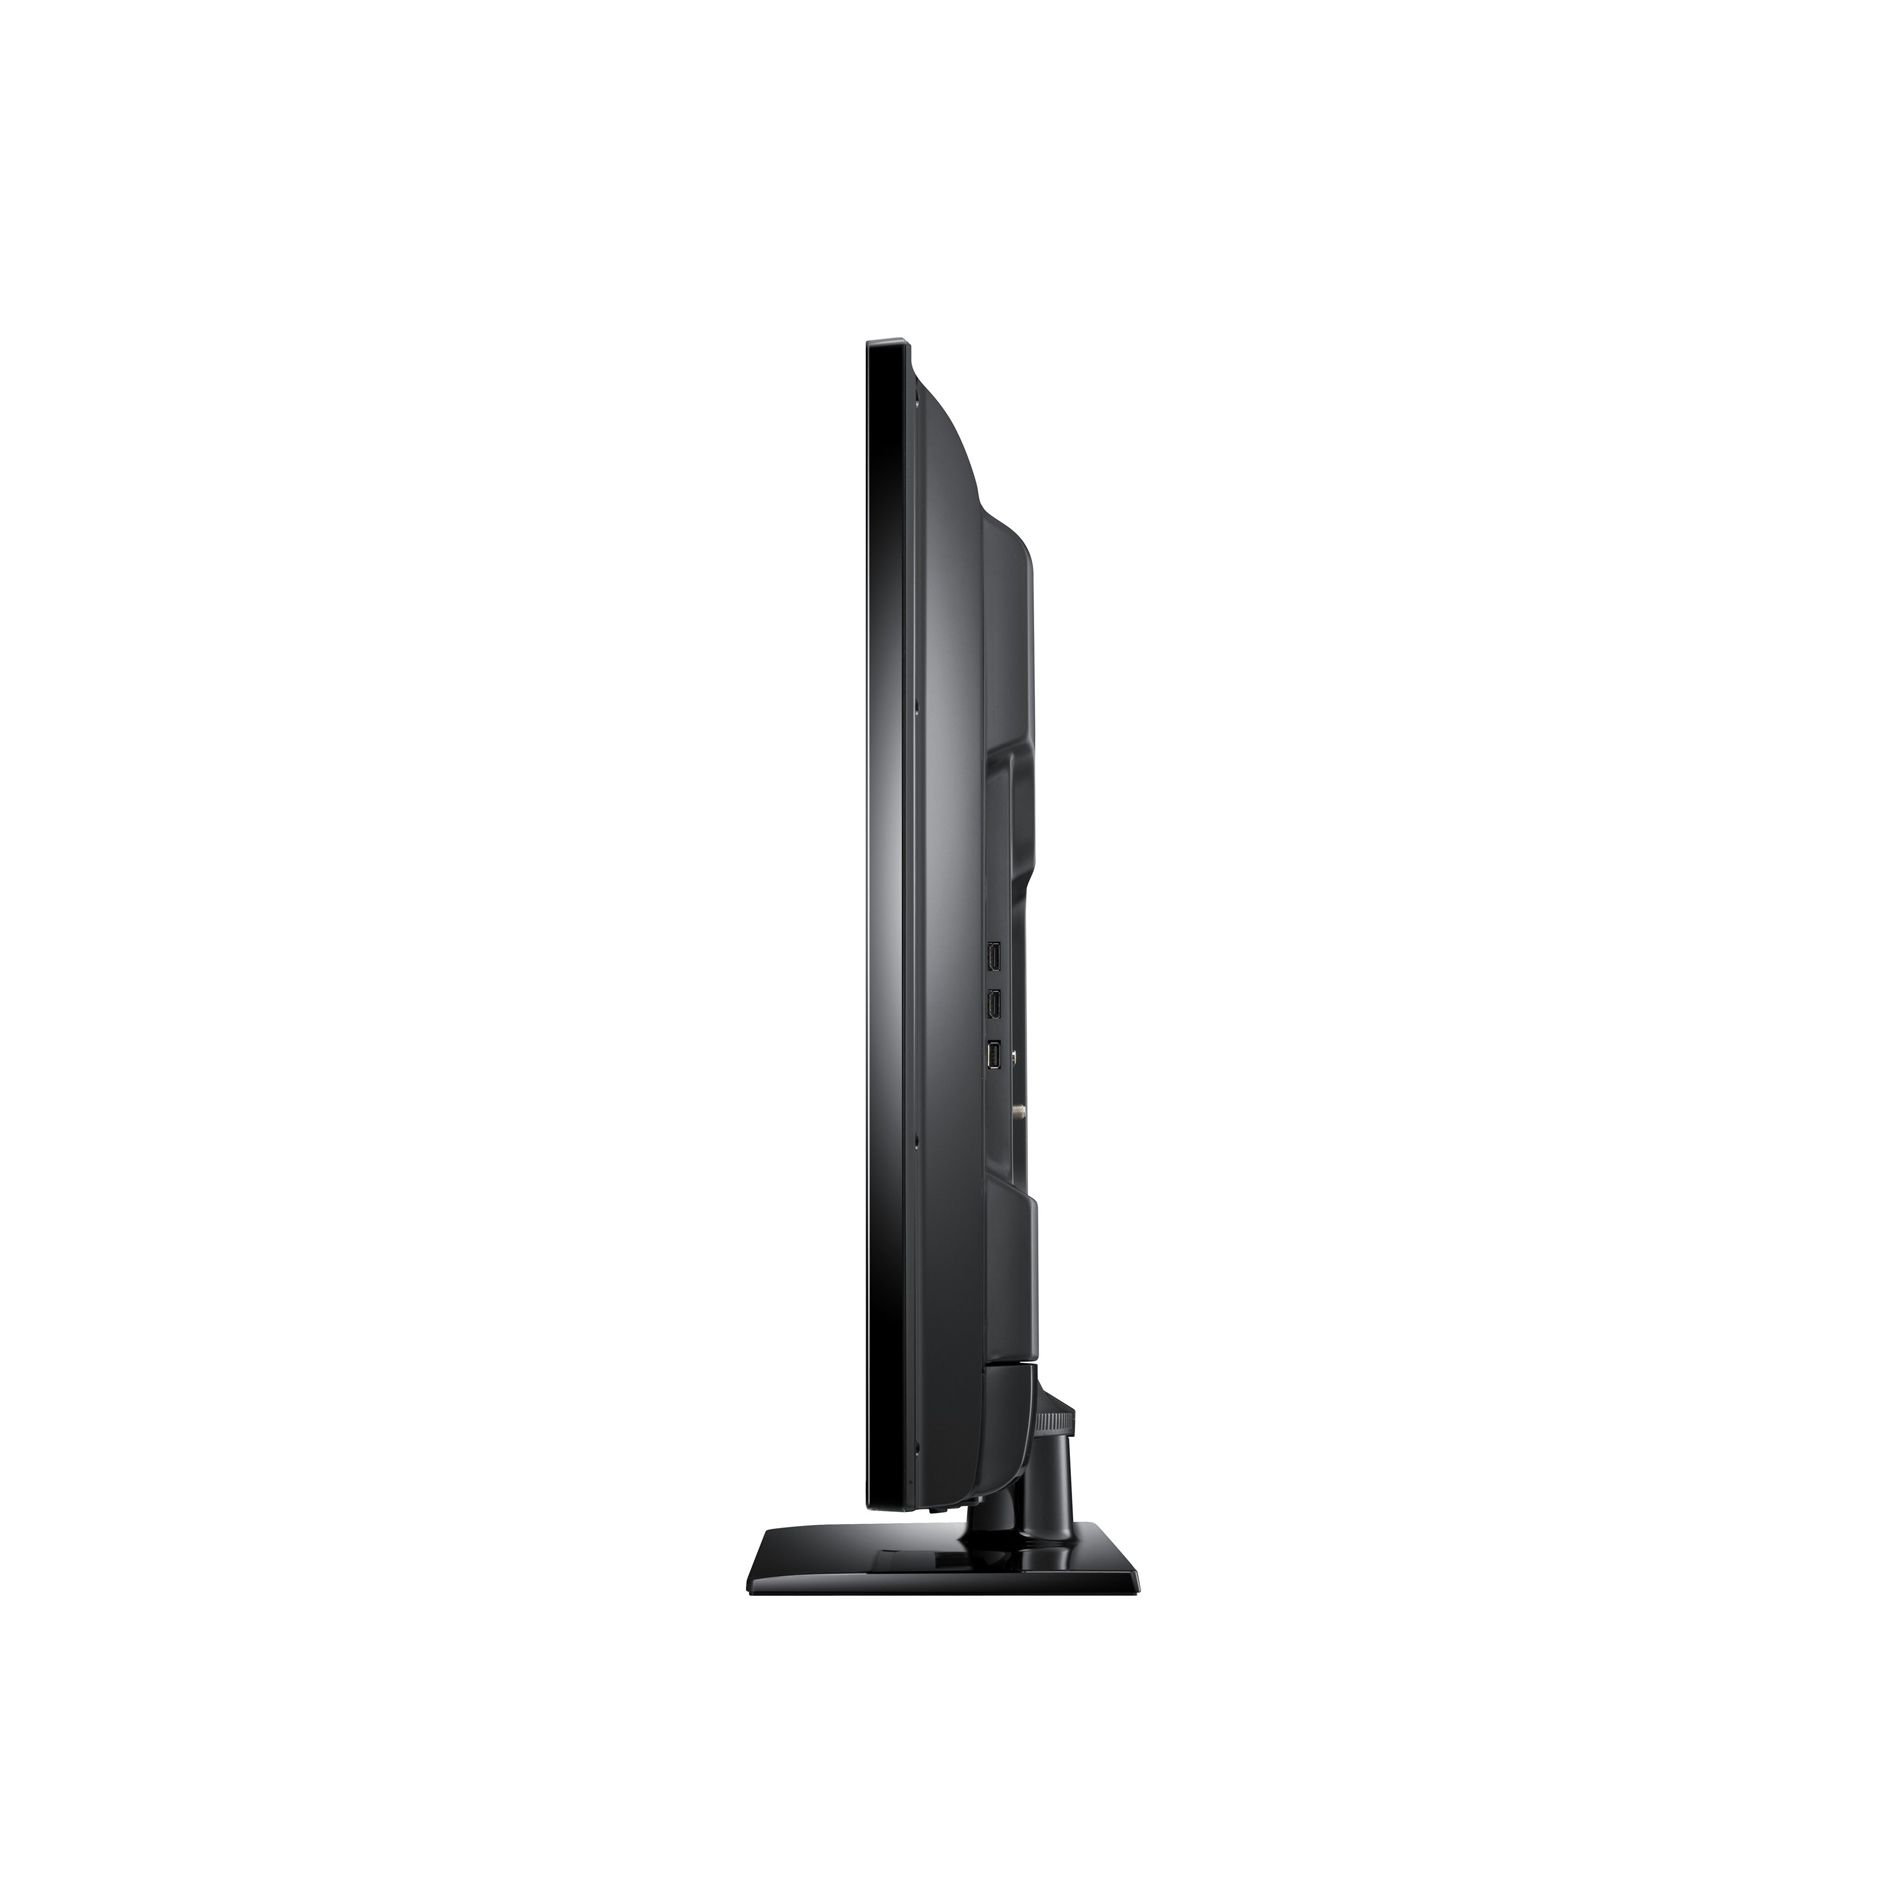 "Samsung 50"" Class 1080p 120Hz LED HDTV - UN50EH6000FXZA"